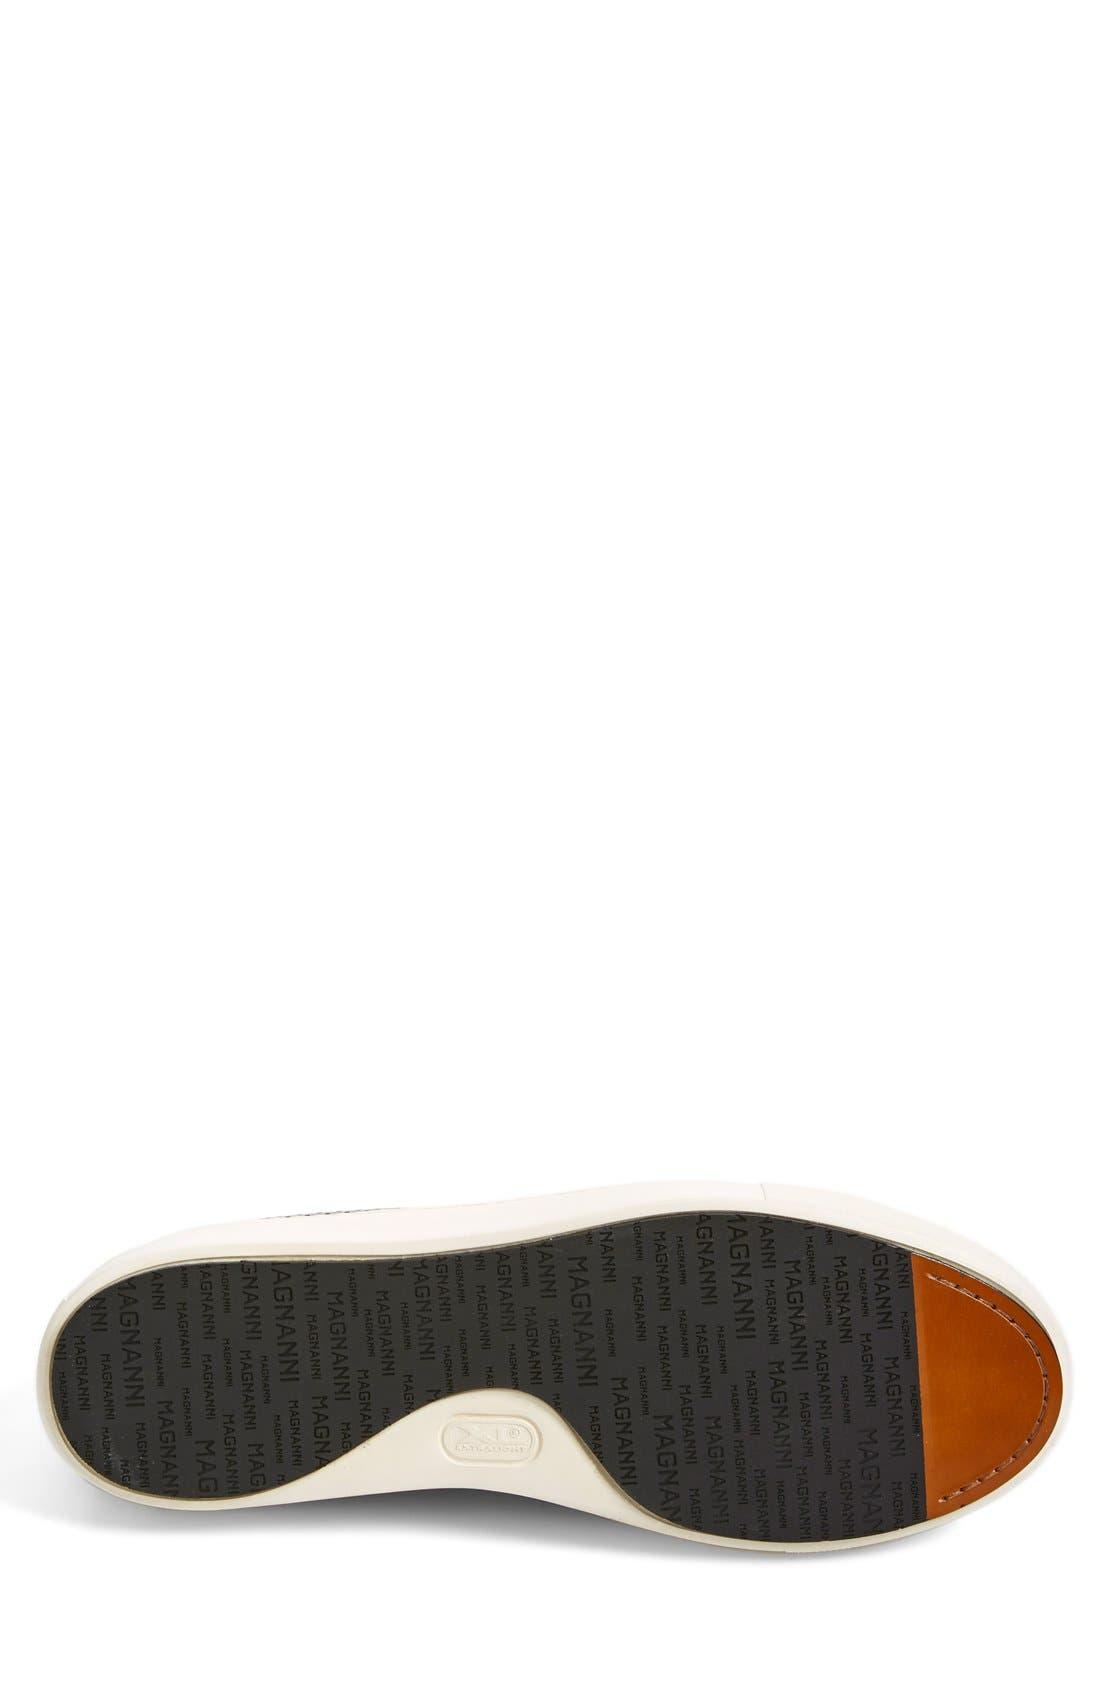 'Blanco' Sneaker,                             Alternate thumbnail 4, color,                             210